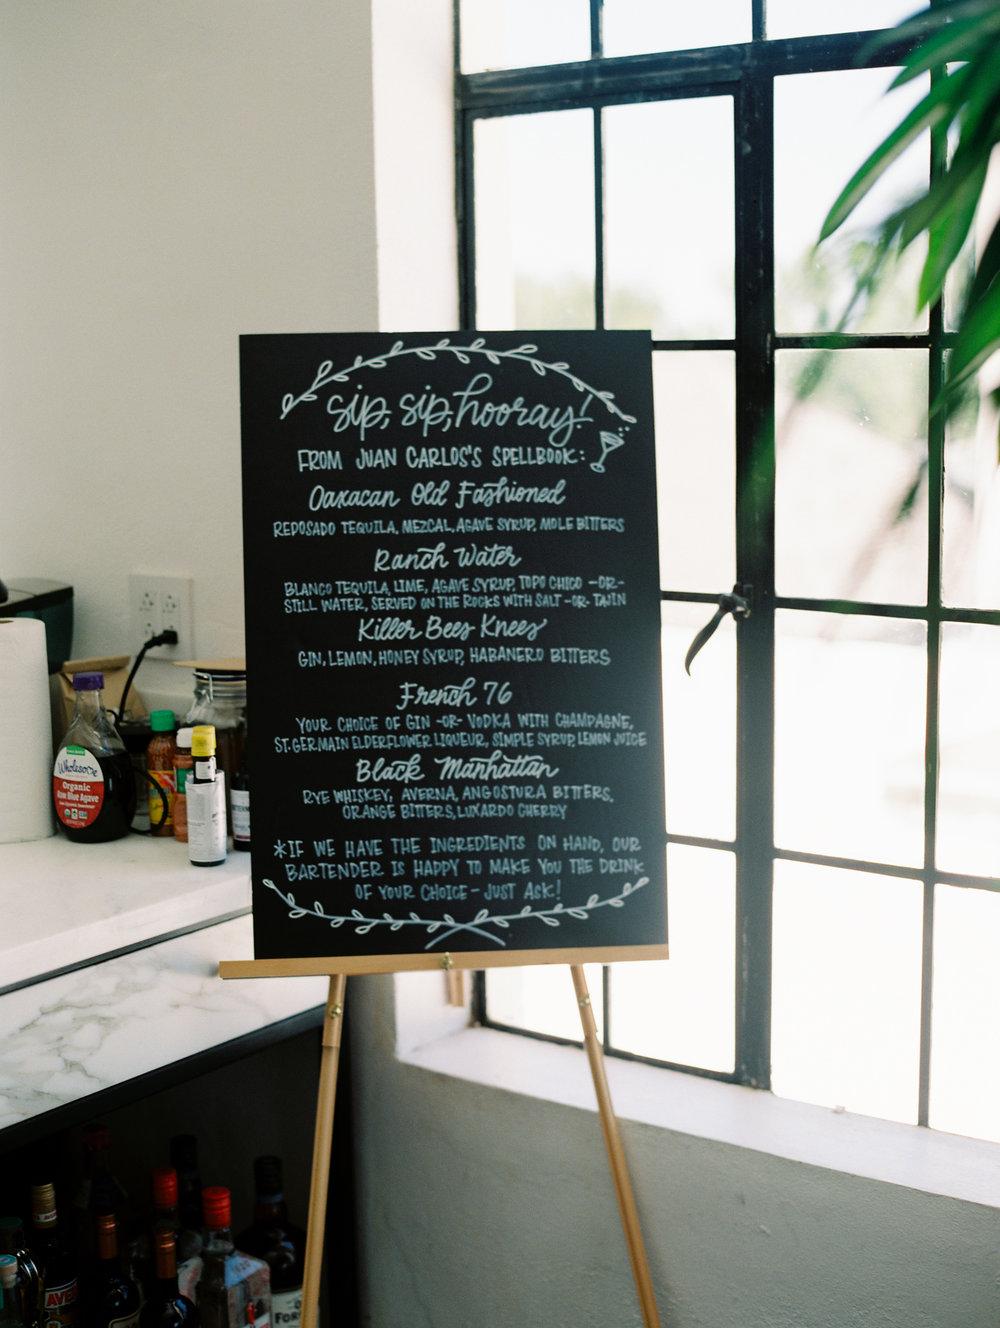 Best-Austin-Texas-Marfa-Wedding-Photographers-fine-art-film-118.jpg